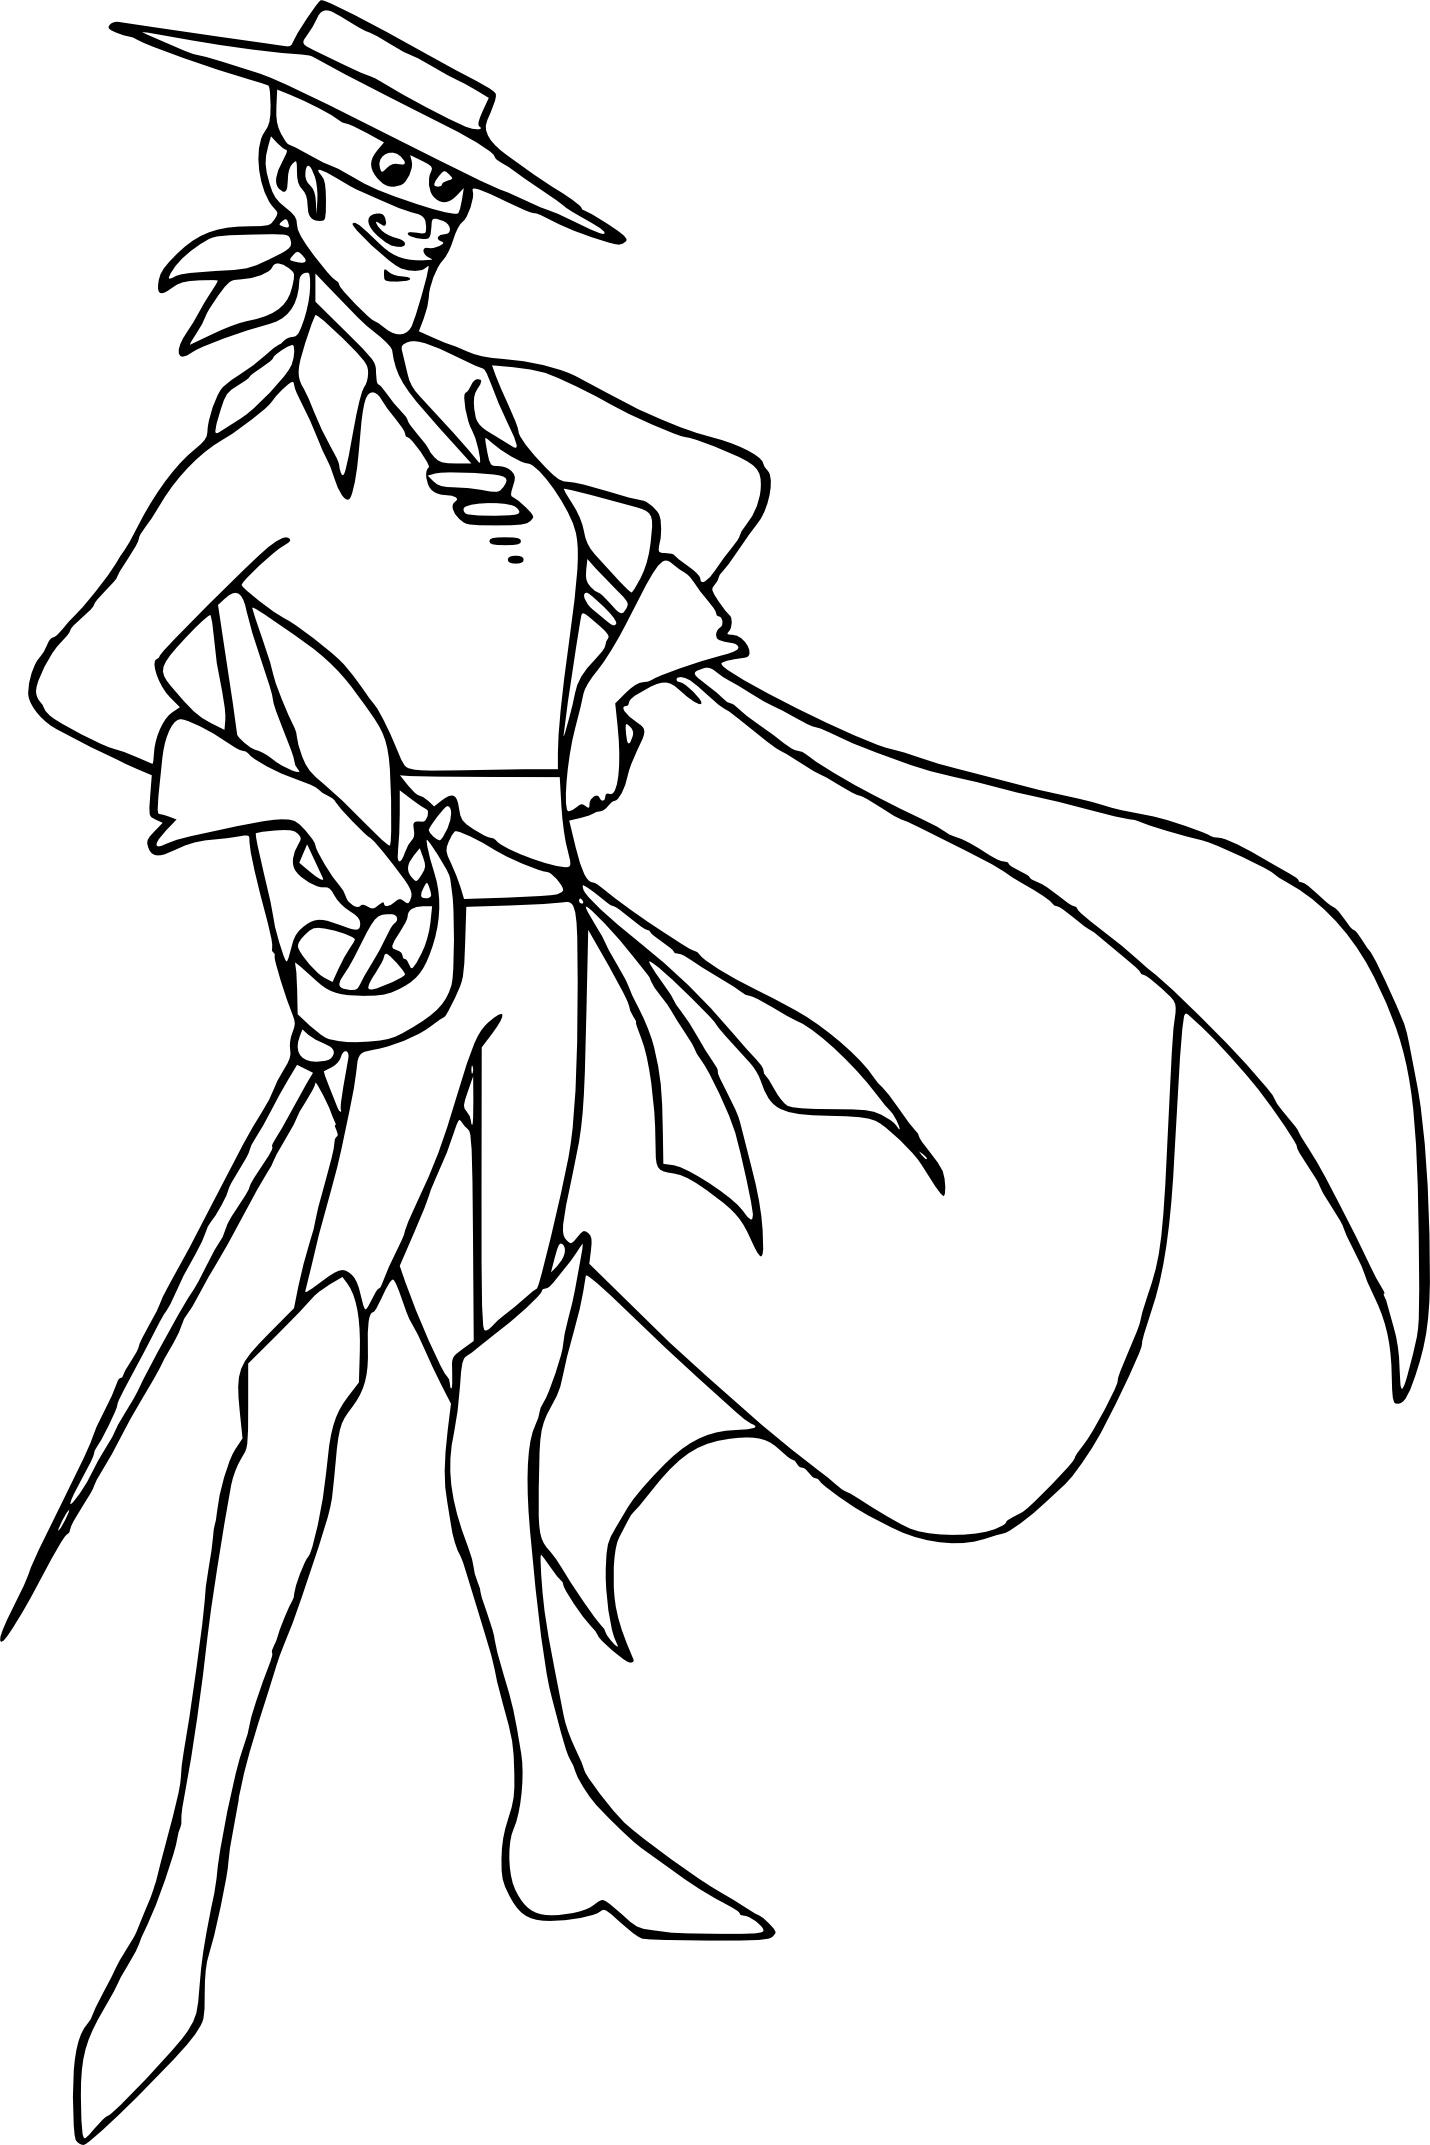 Coloriage Zorro À Imprimer avec Dessin Coloriage A Imprimer